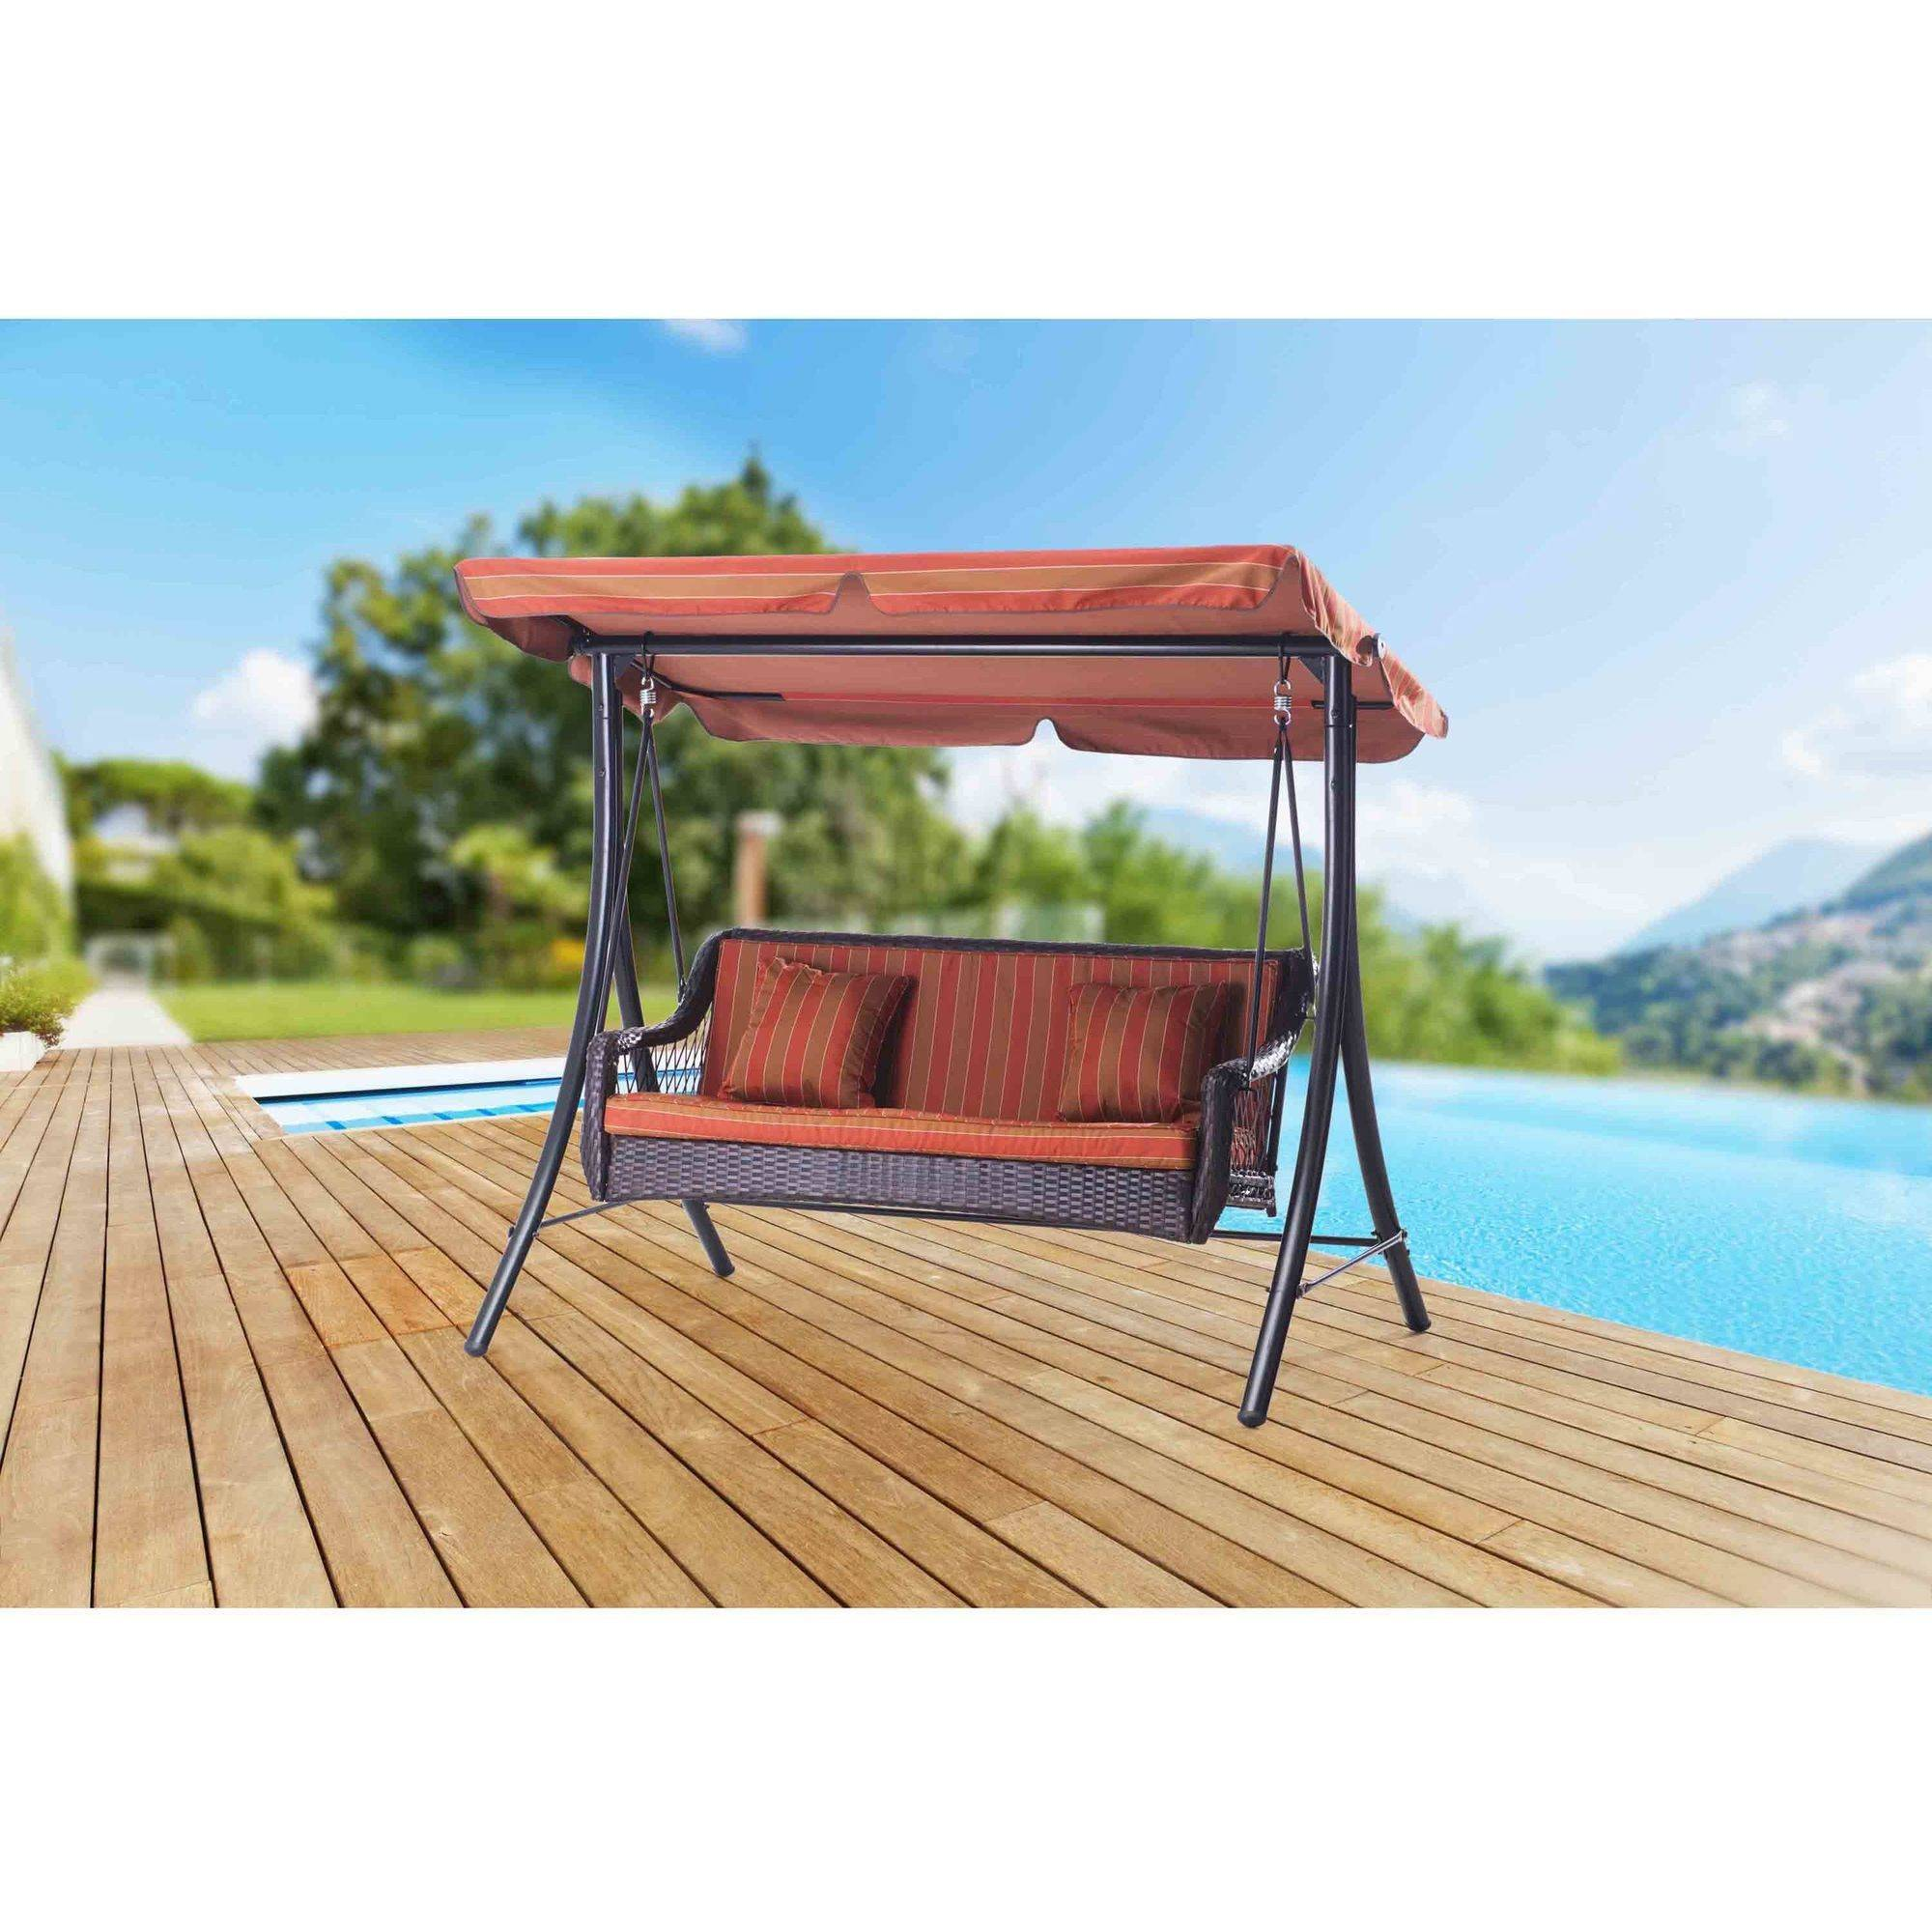 "Sunjoy 110205004 Curry Steel Porch Swing, 81"" x 65"" x 68"" by SunNest Services LLC"